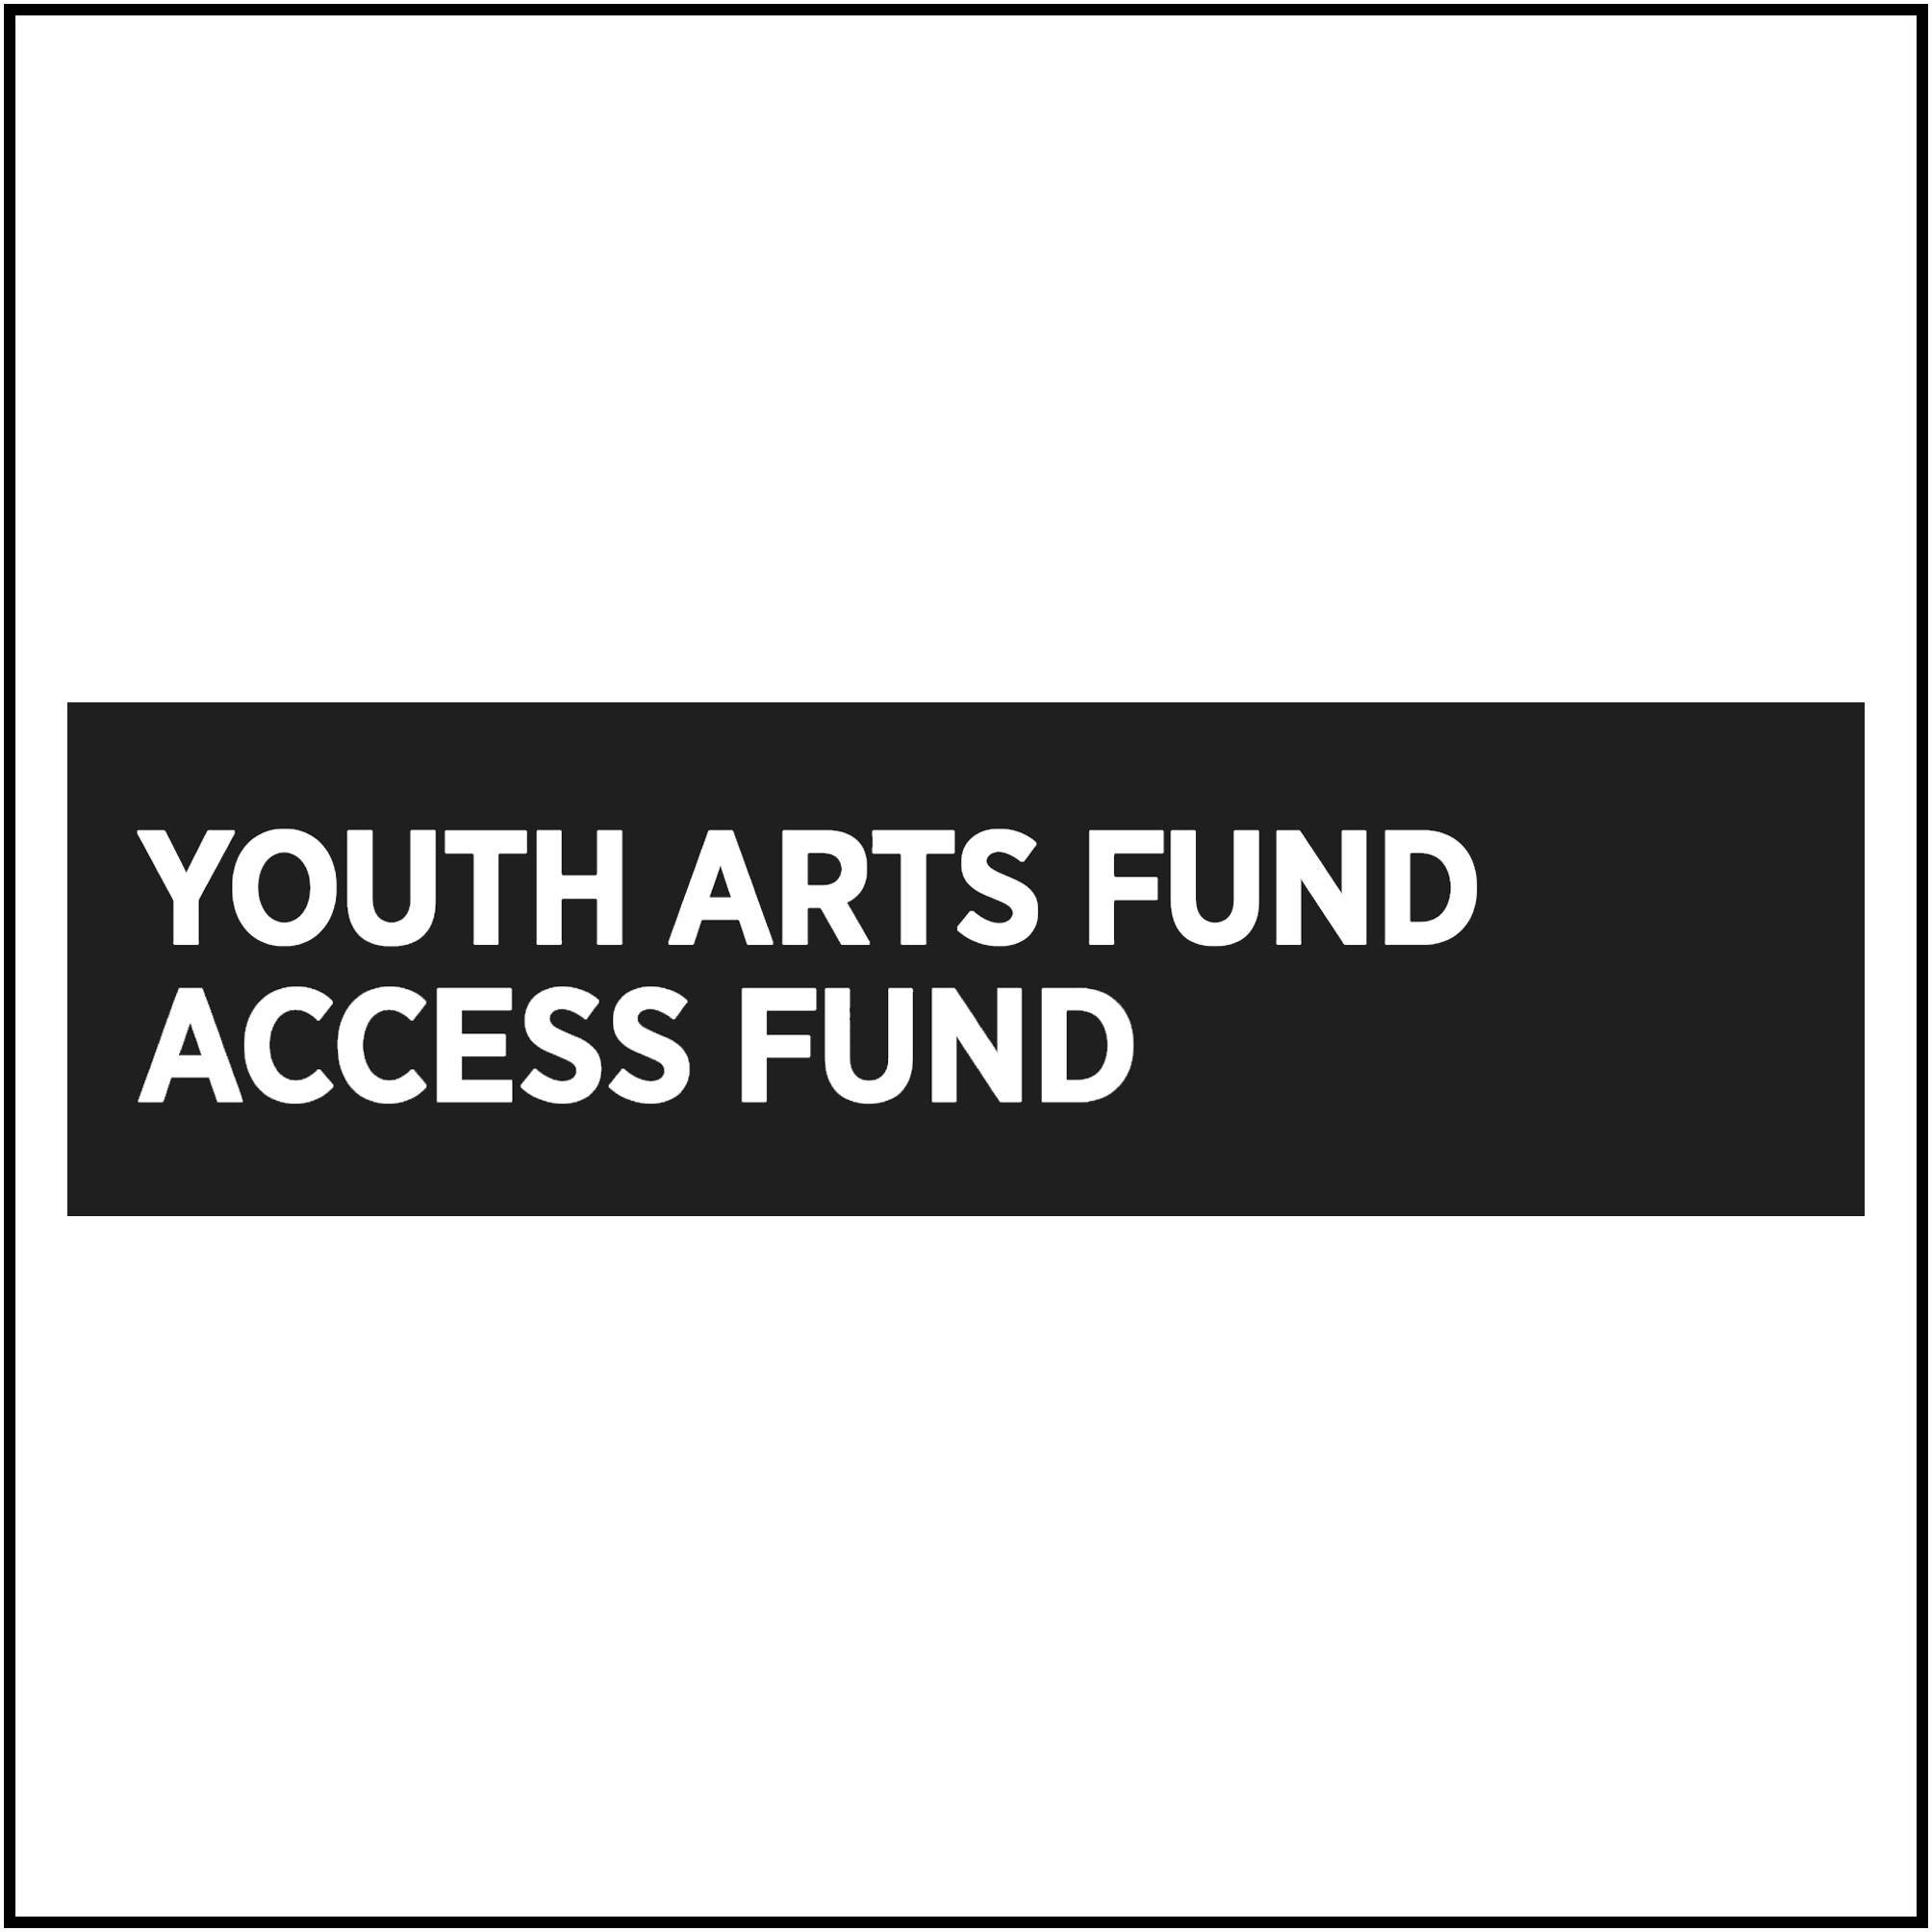 Youth Arts Fund Access Fund logo